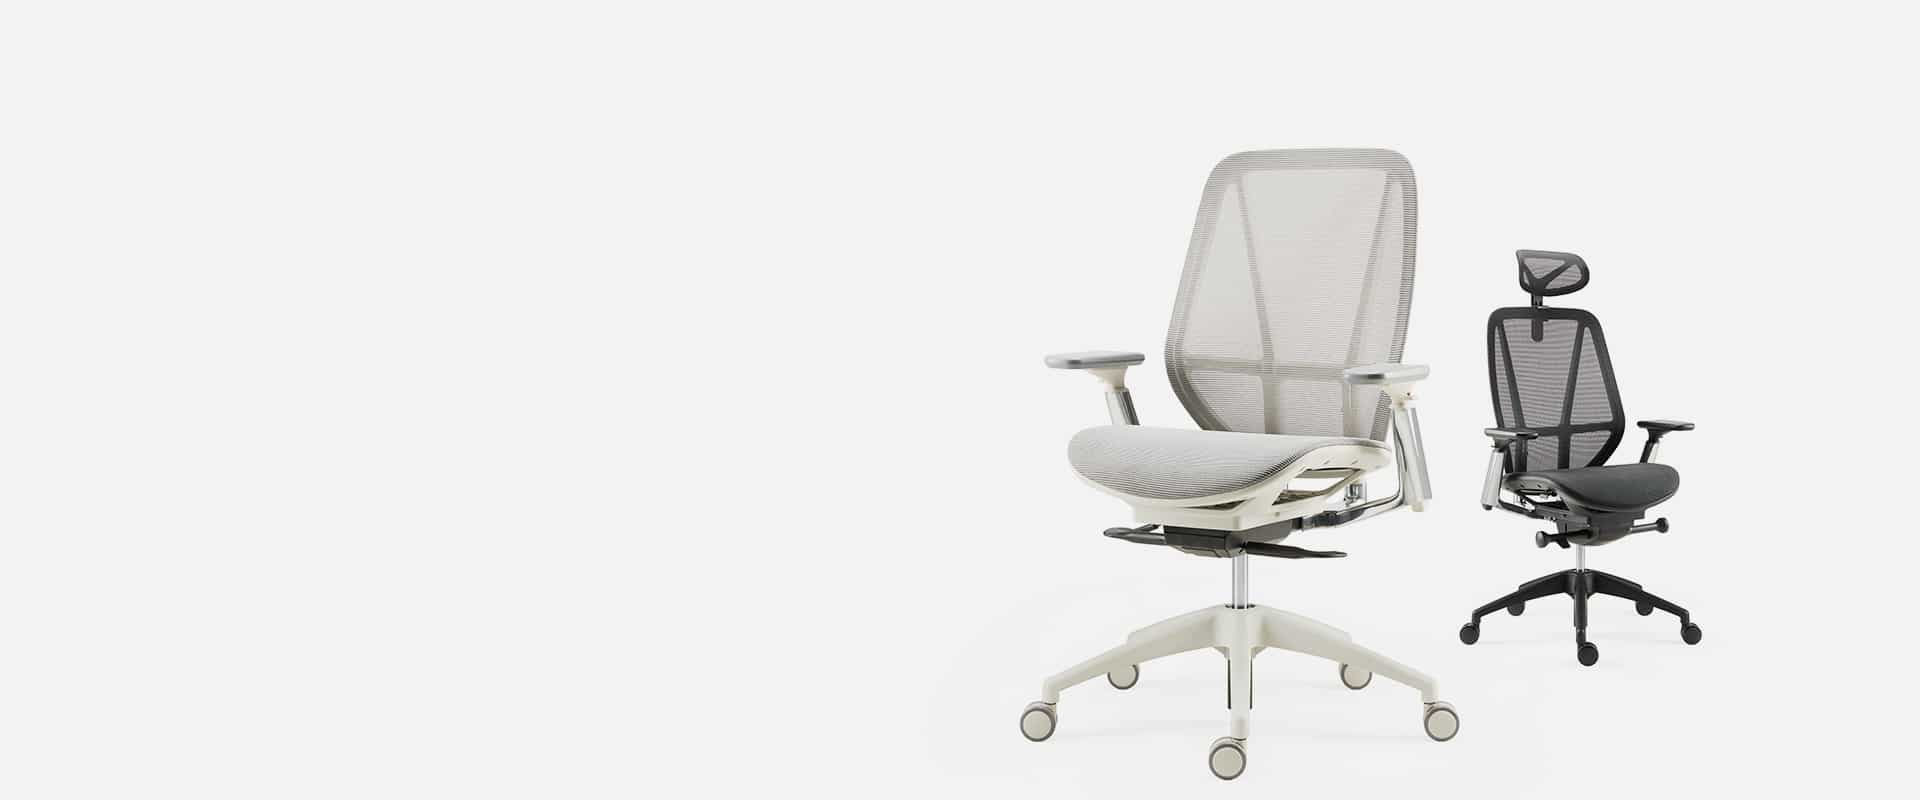 HUP Task Chairs